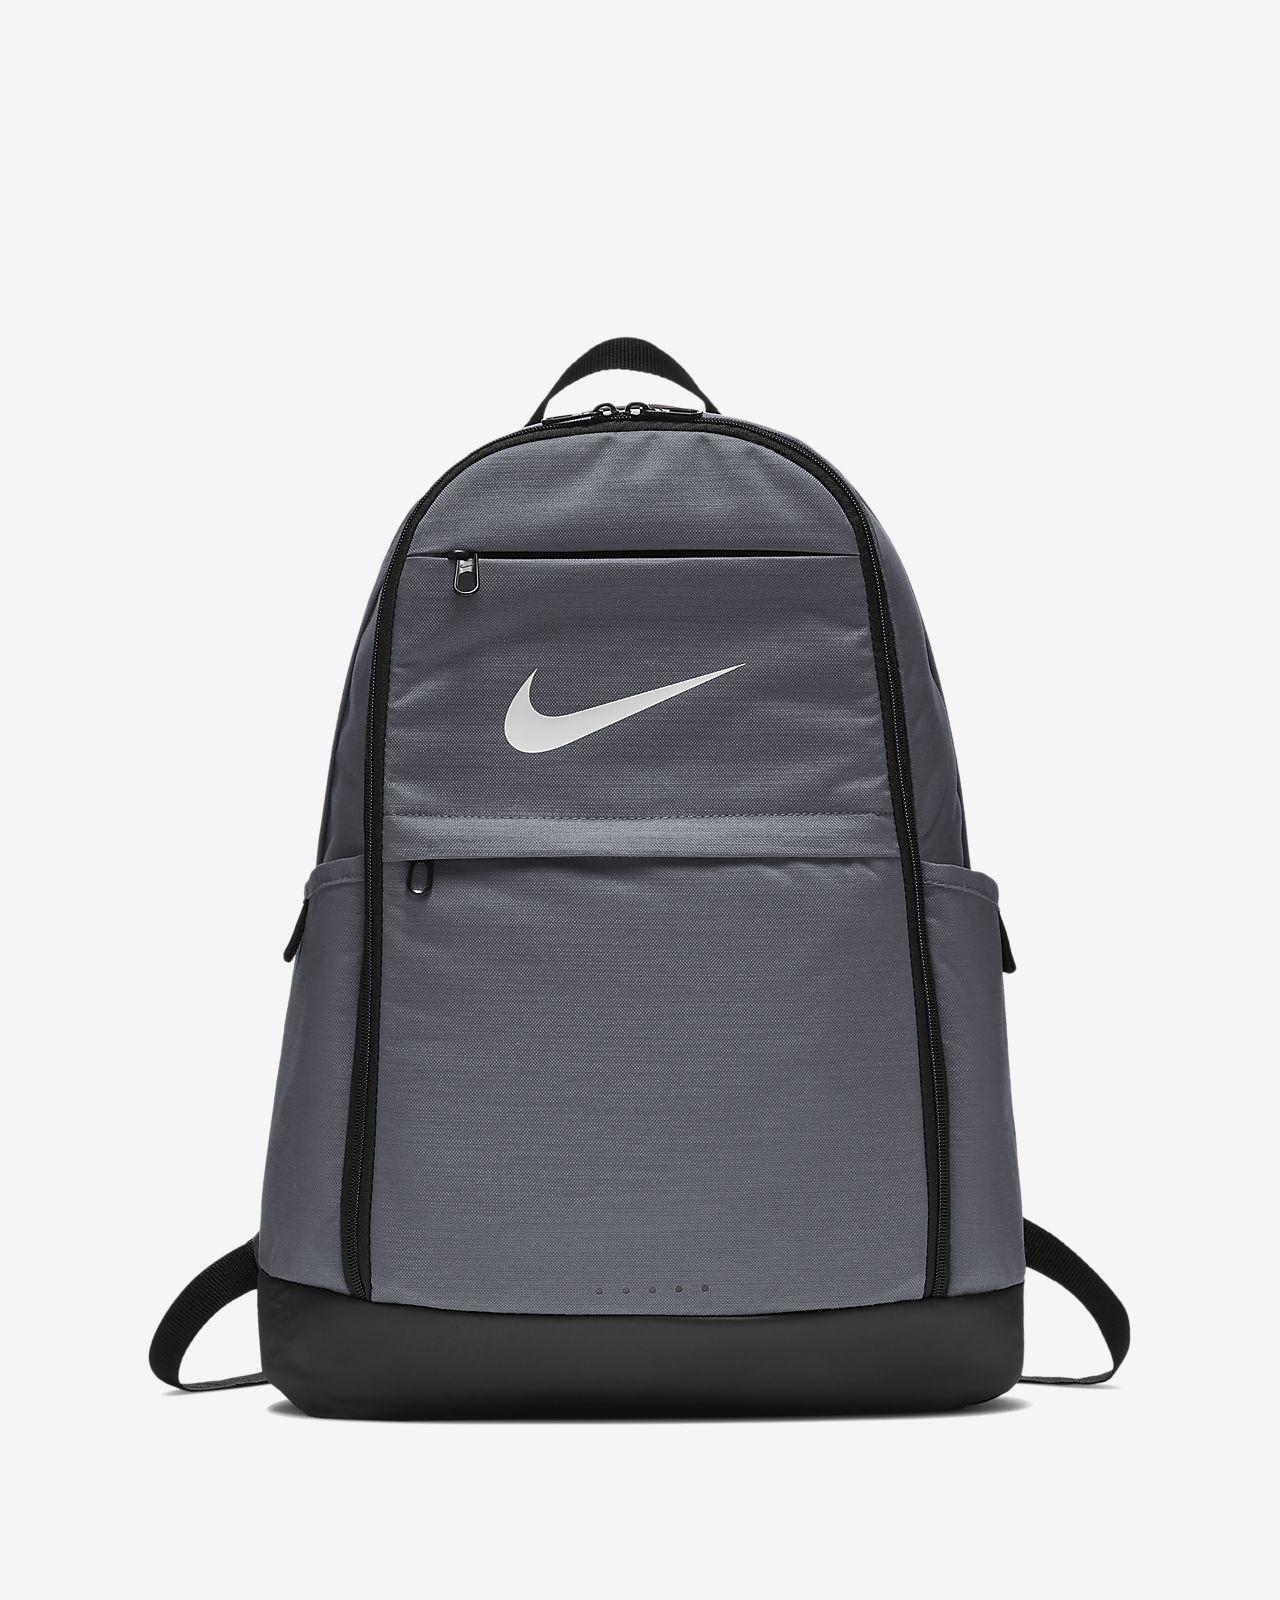 a39dca7468f Nike Brasilia. $60. Low Resolution Nike Brasilia Training Backpack ...